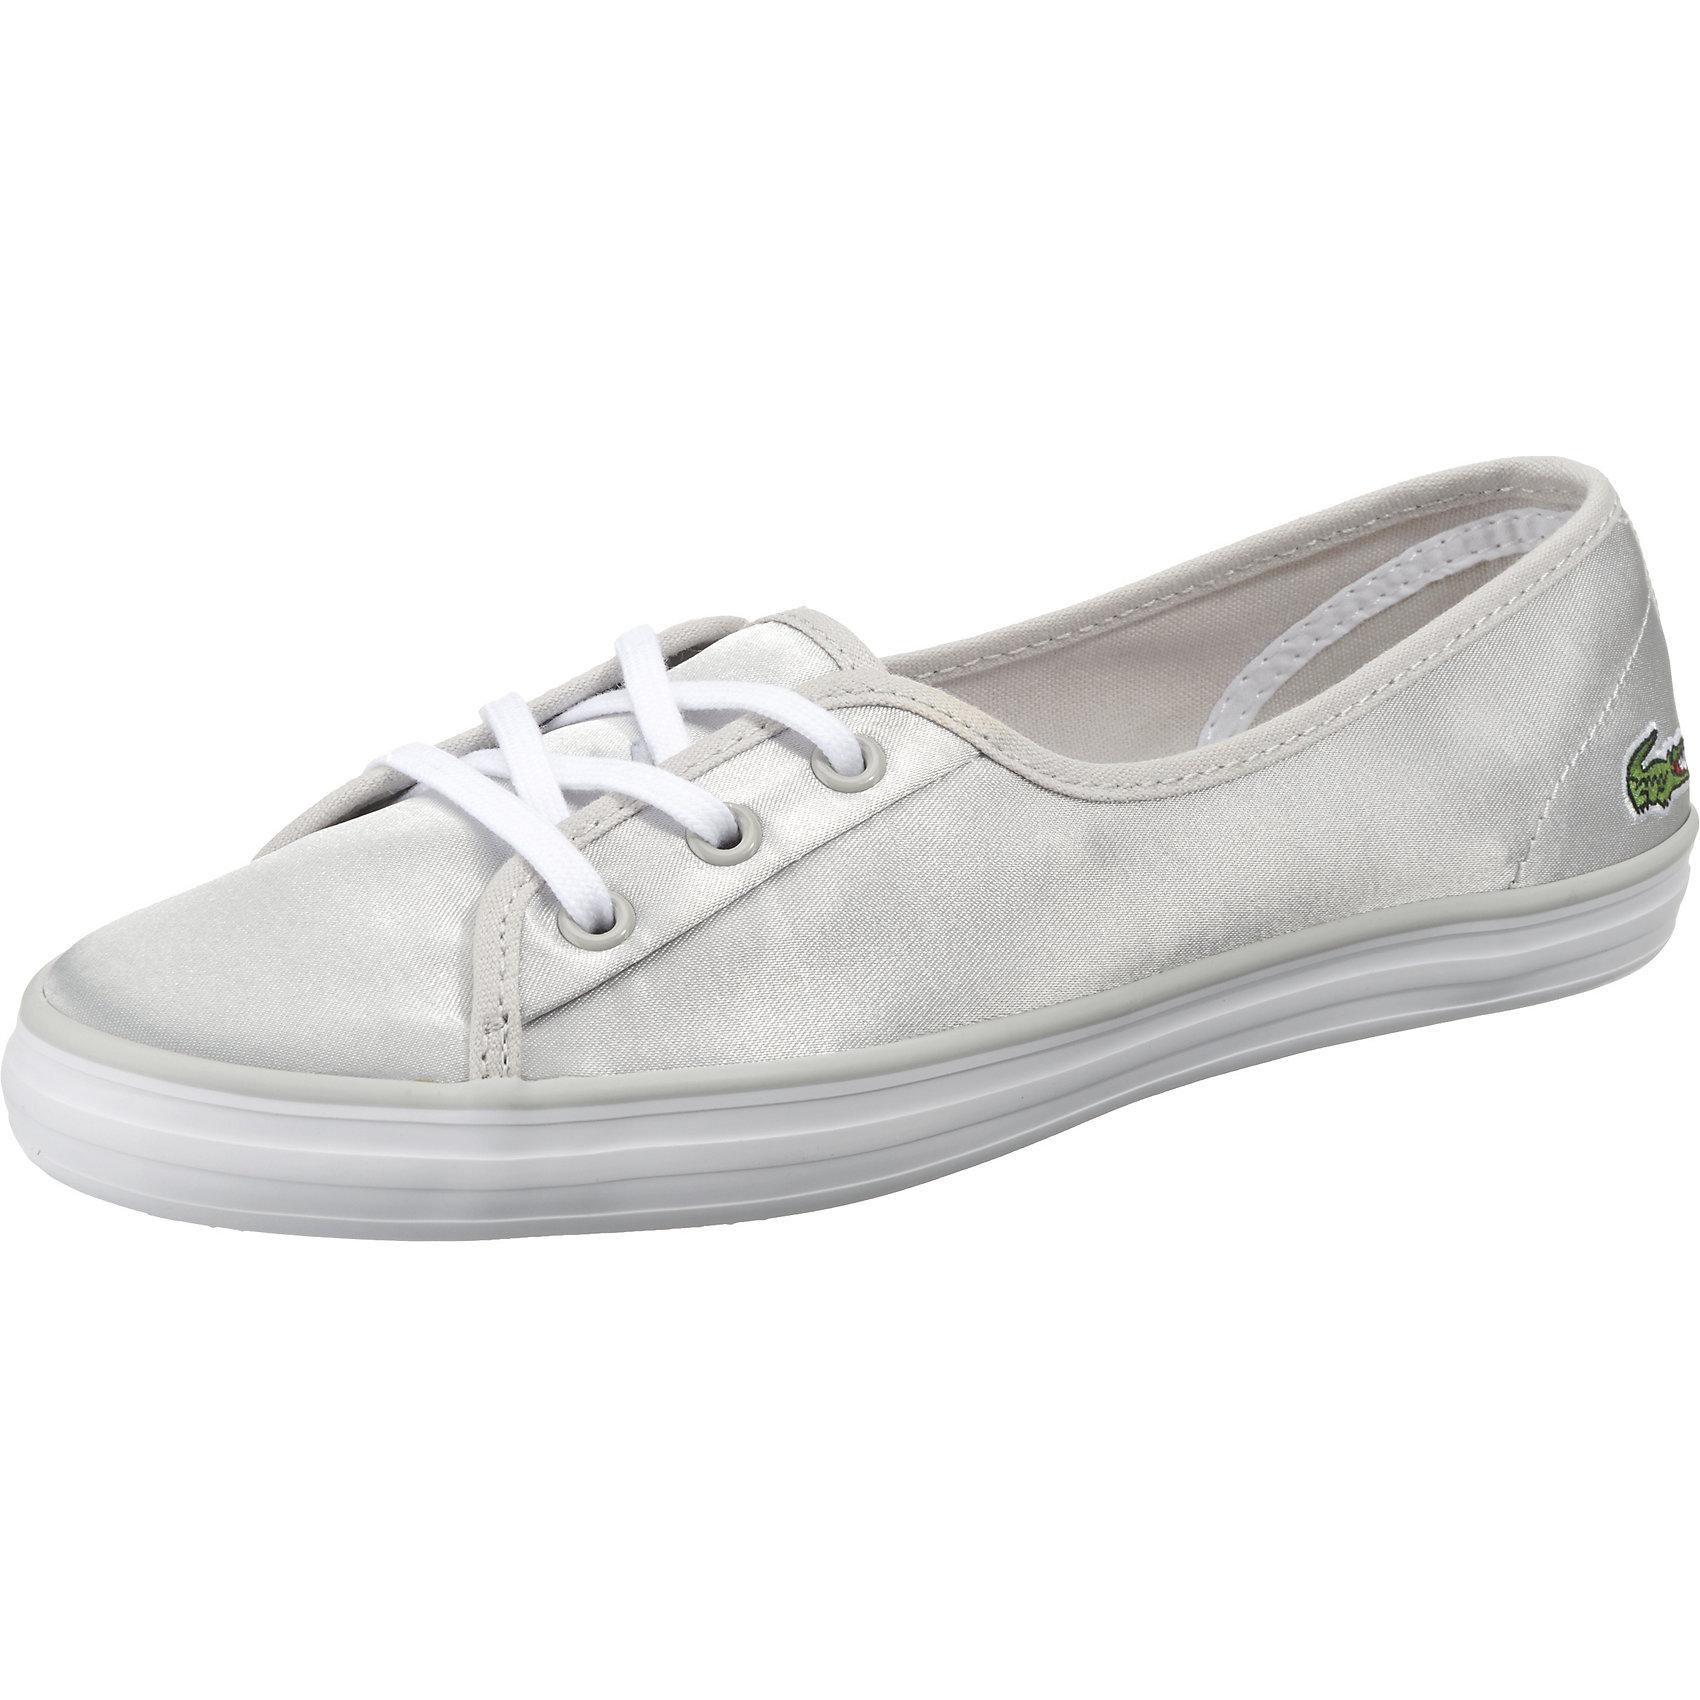 Neu LACOSTE Ziane Chunky 118 1 1 1 Caw   Sneakers 7064810 für Damen c44485